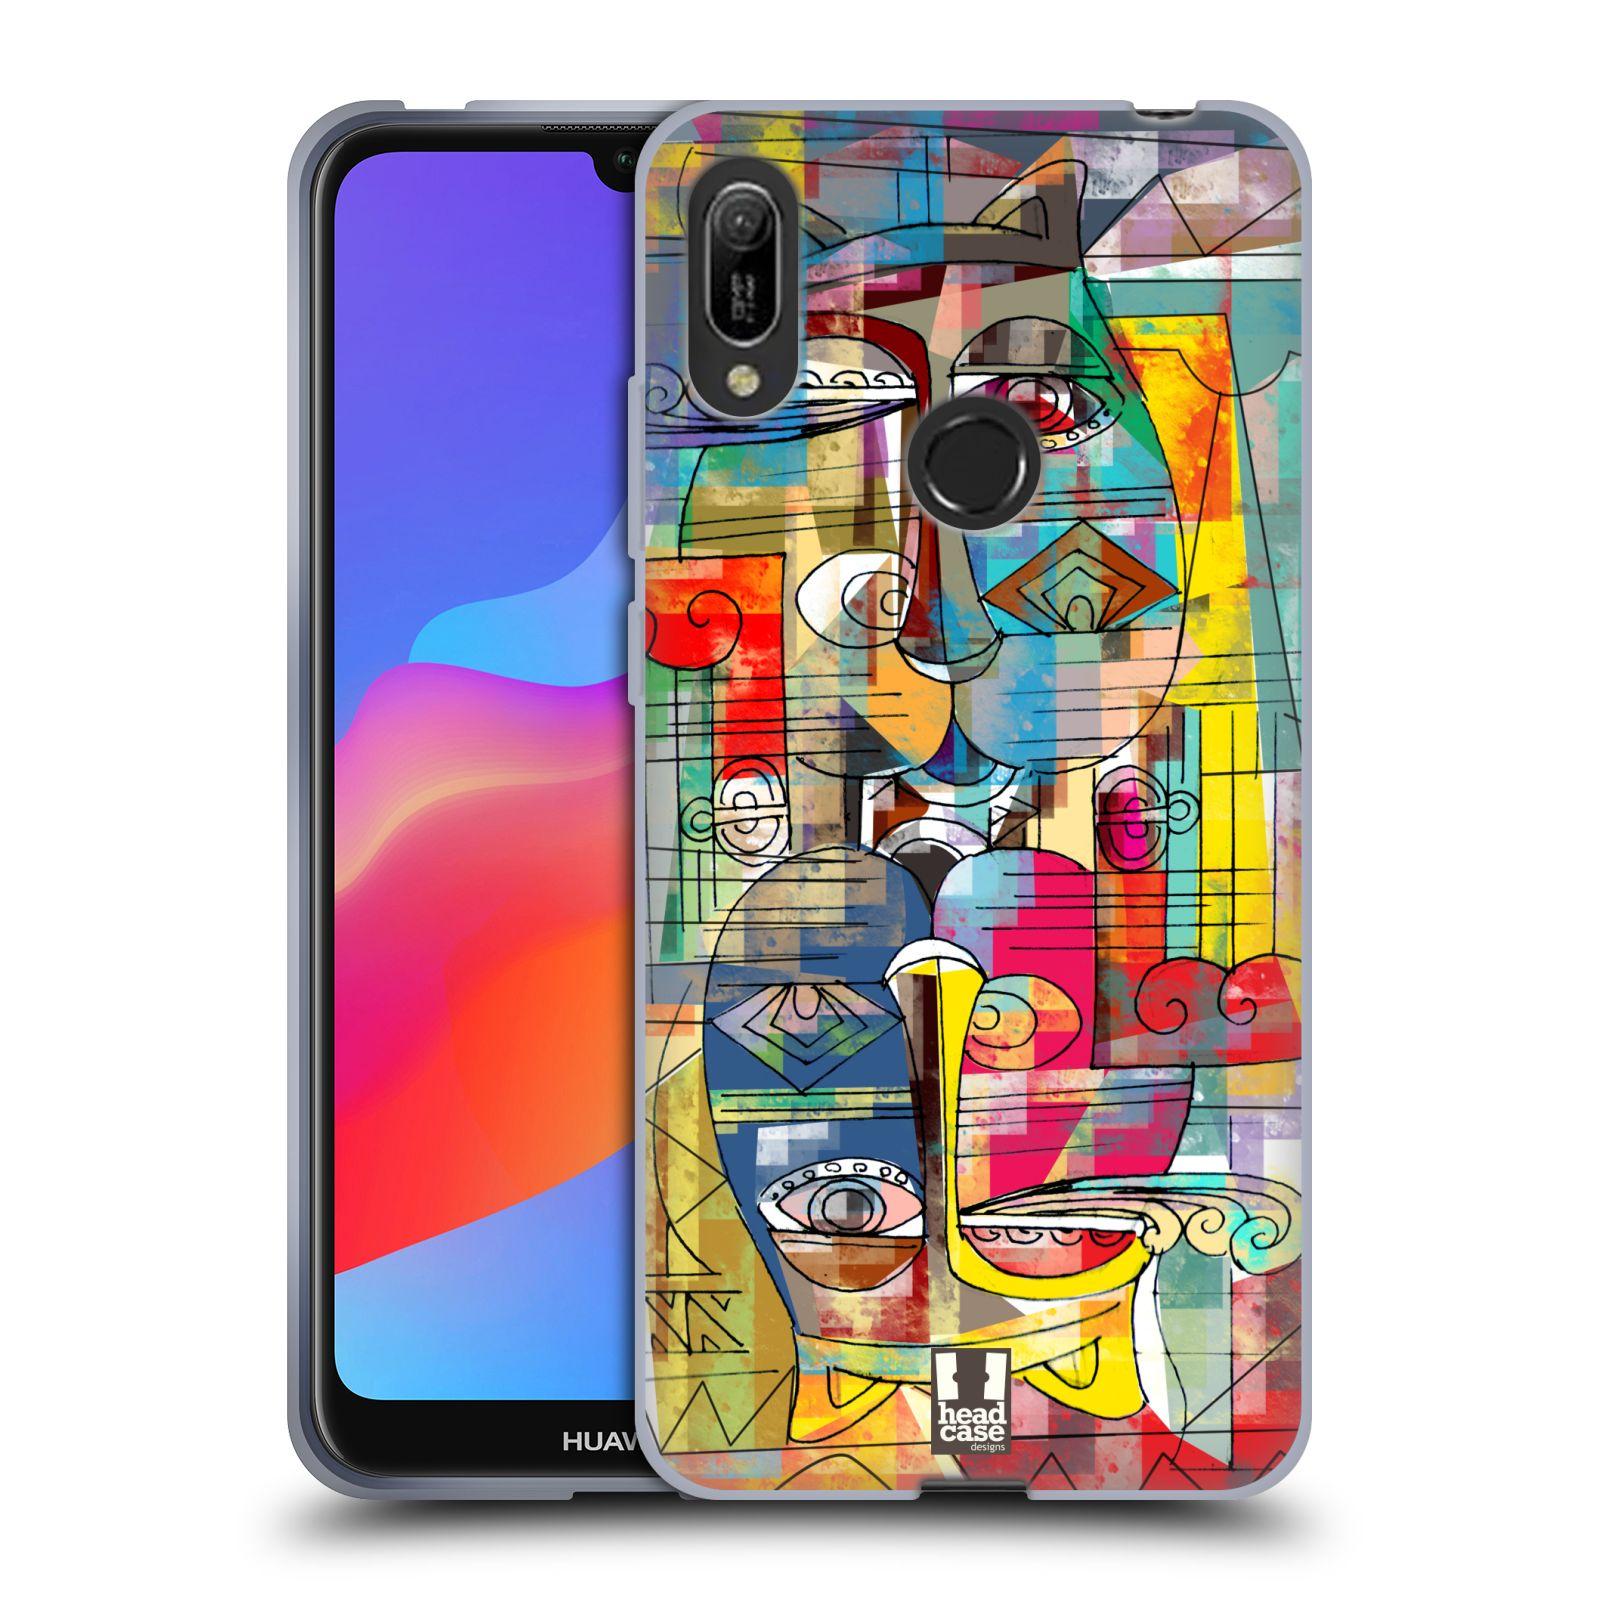 Silikonové pouzdro na mobil Huawei Y6 (2019) - Head Case - AZTEC MANX